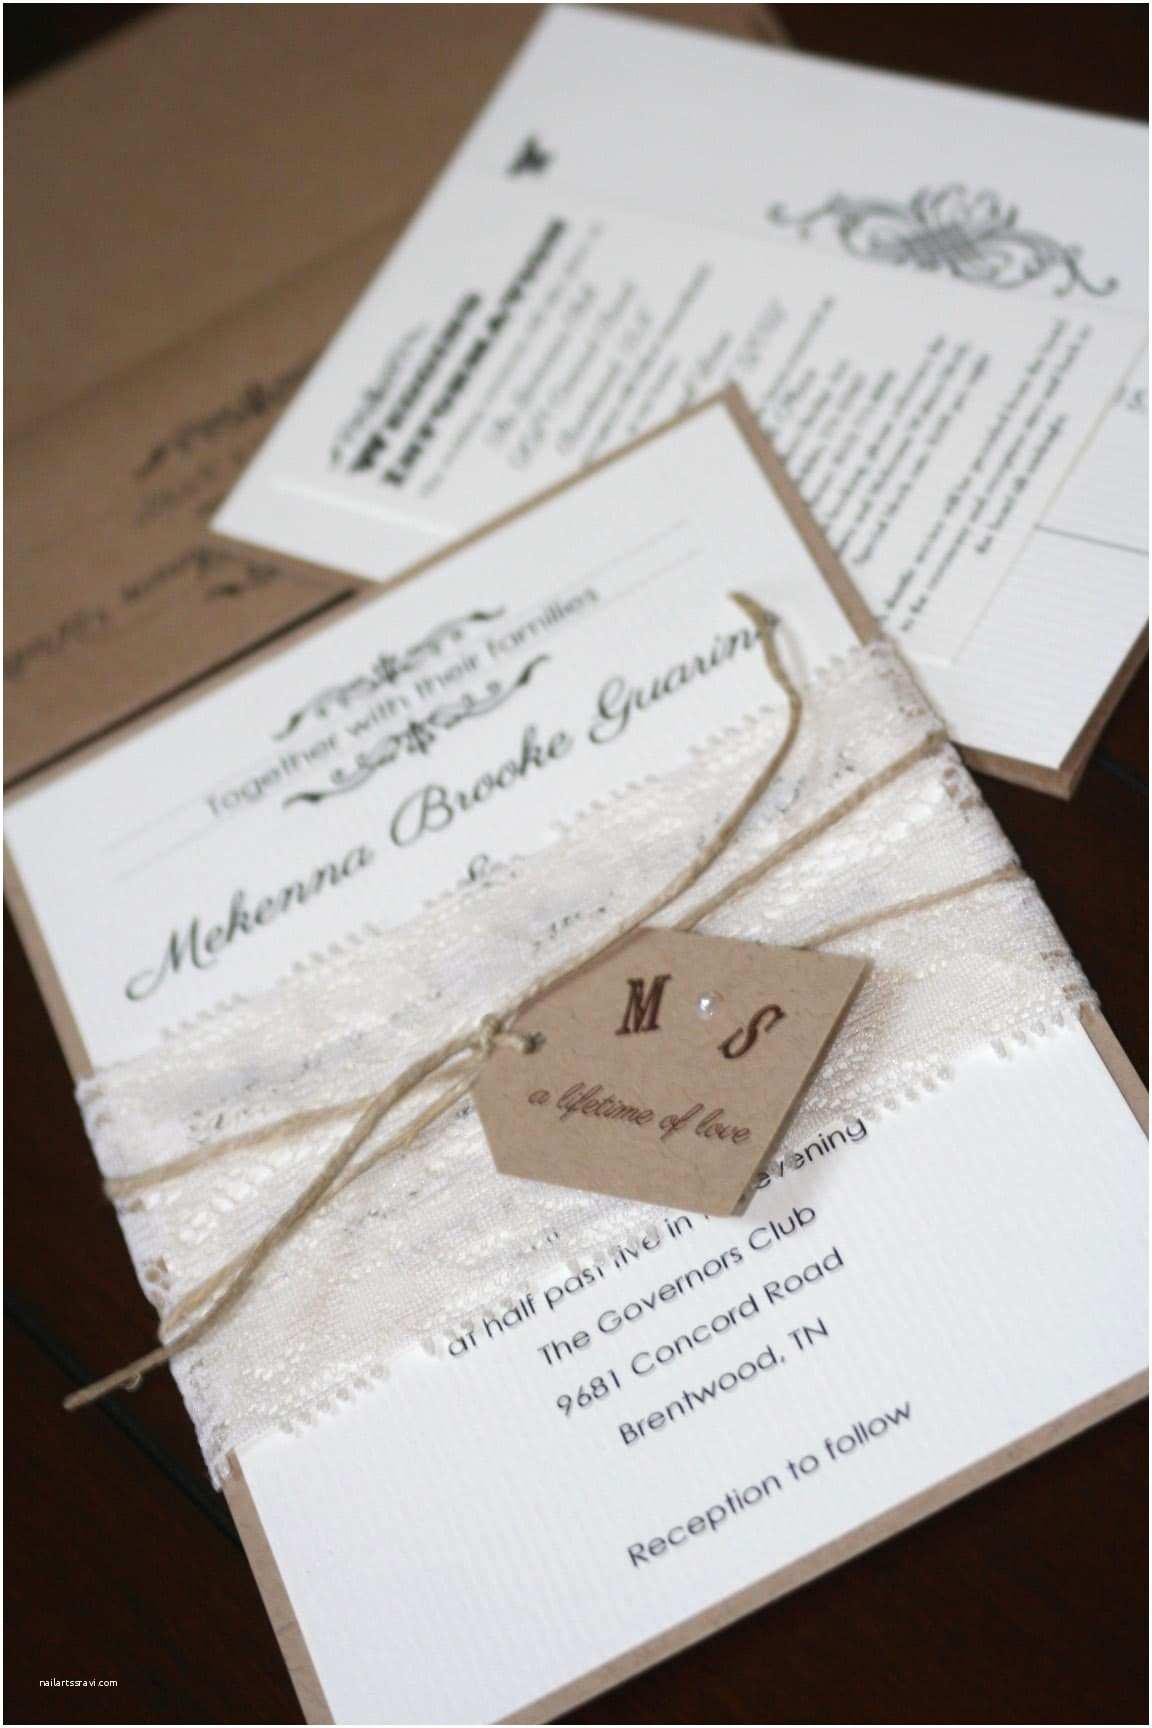 Chic Wedding Invitations Summer In Full Swing too Chic & Little Shab Design